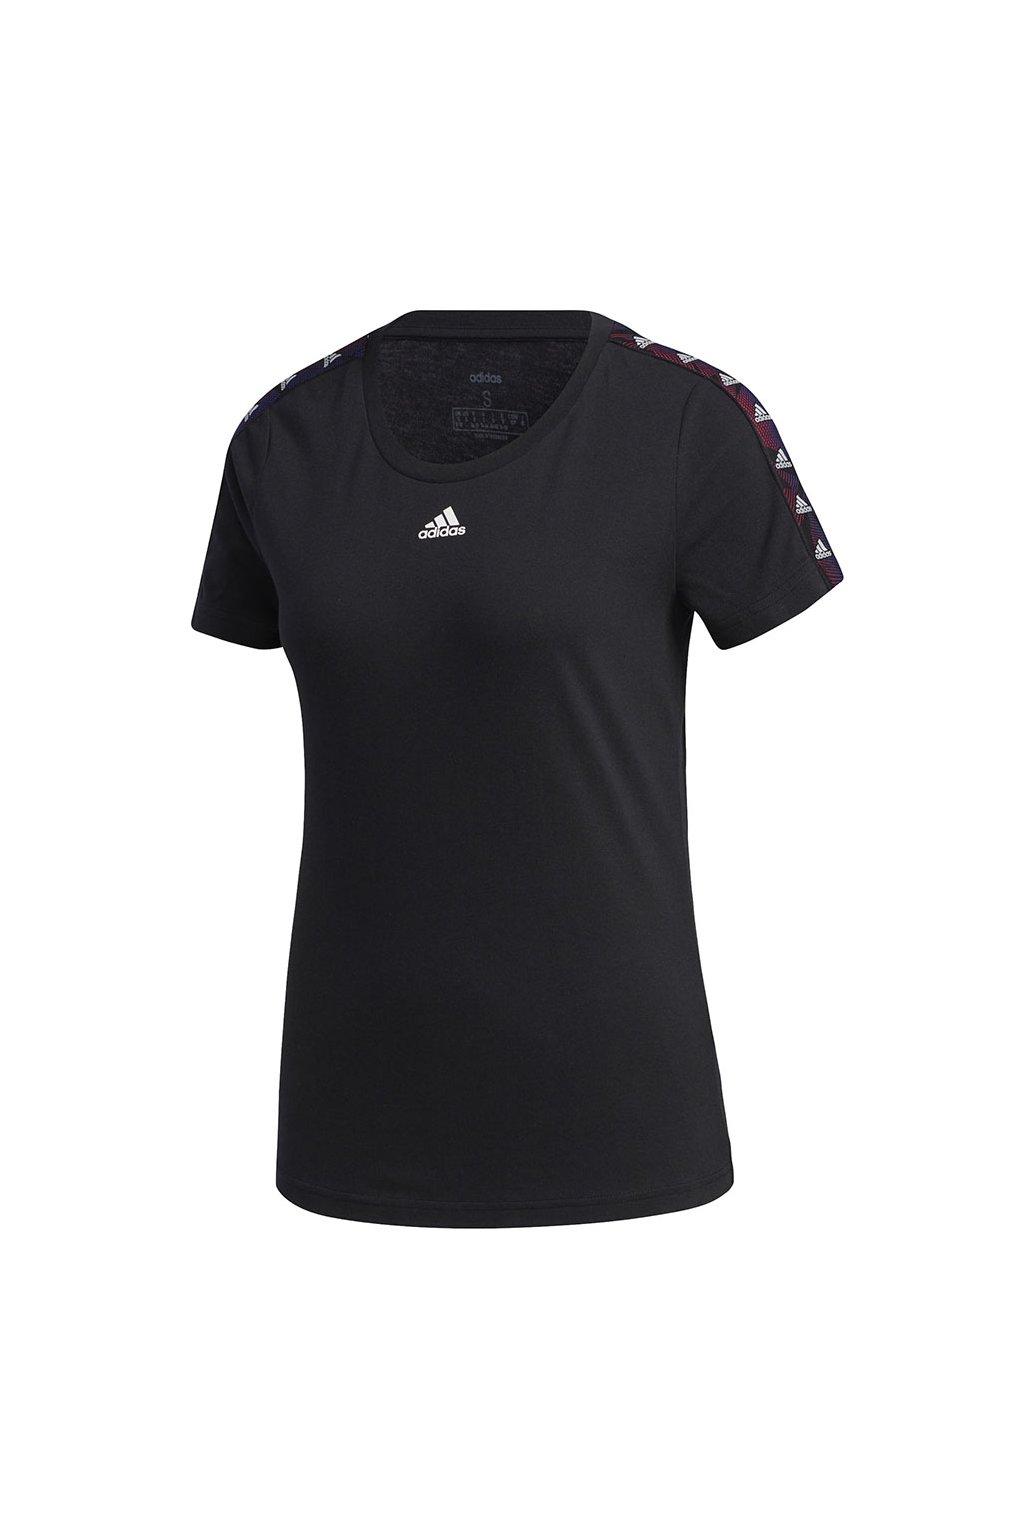 Dámske Tričko adidas W E TPE T čierne GE1128